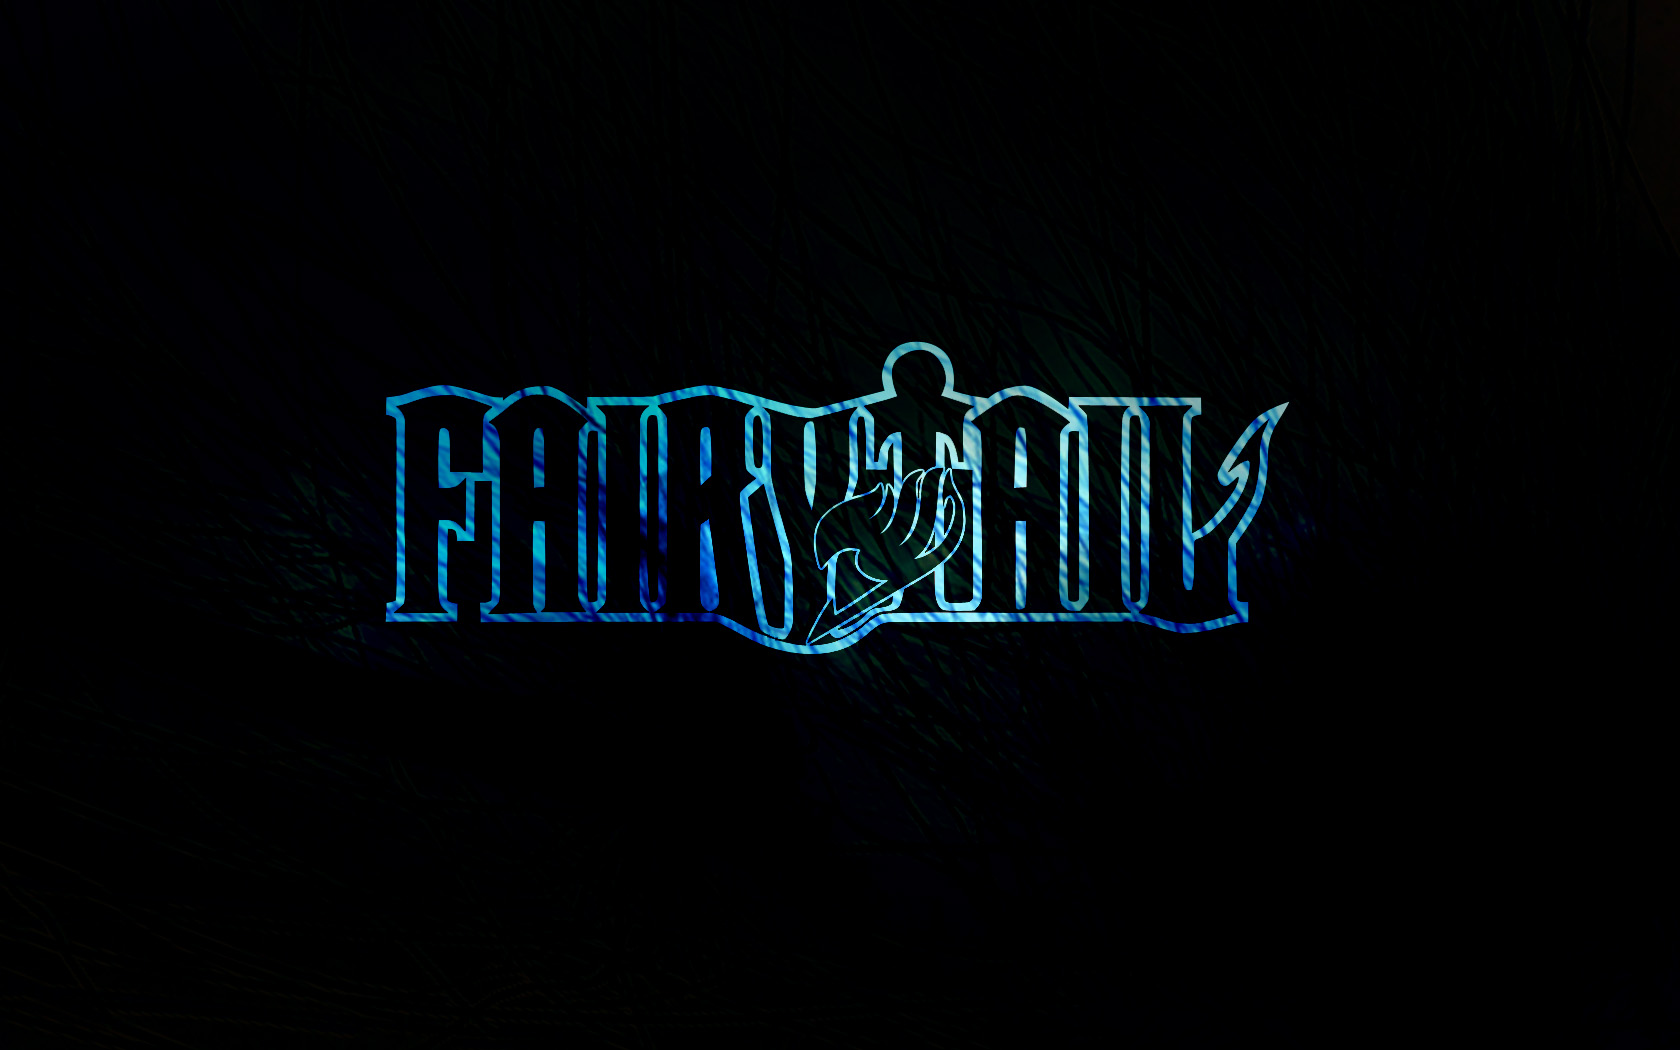 Fairy Tail Blue by justkyledavid 1680x1050